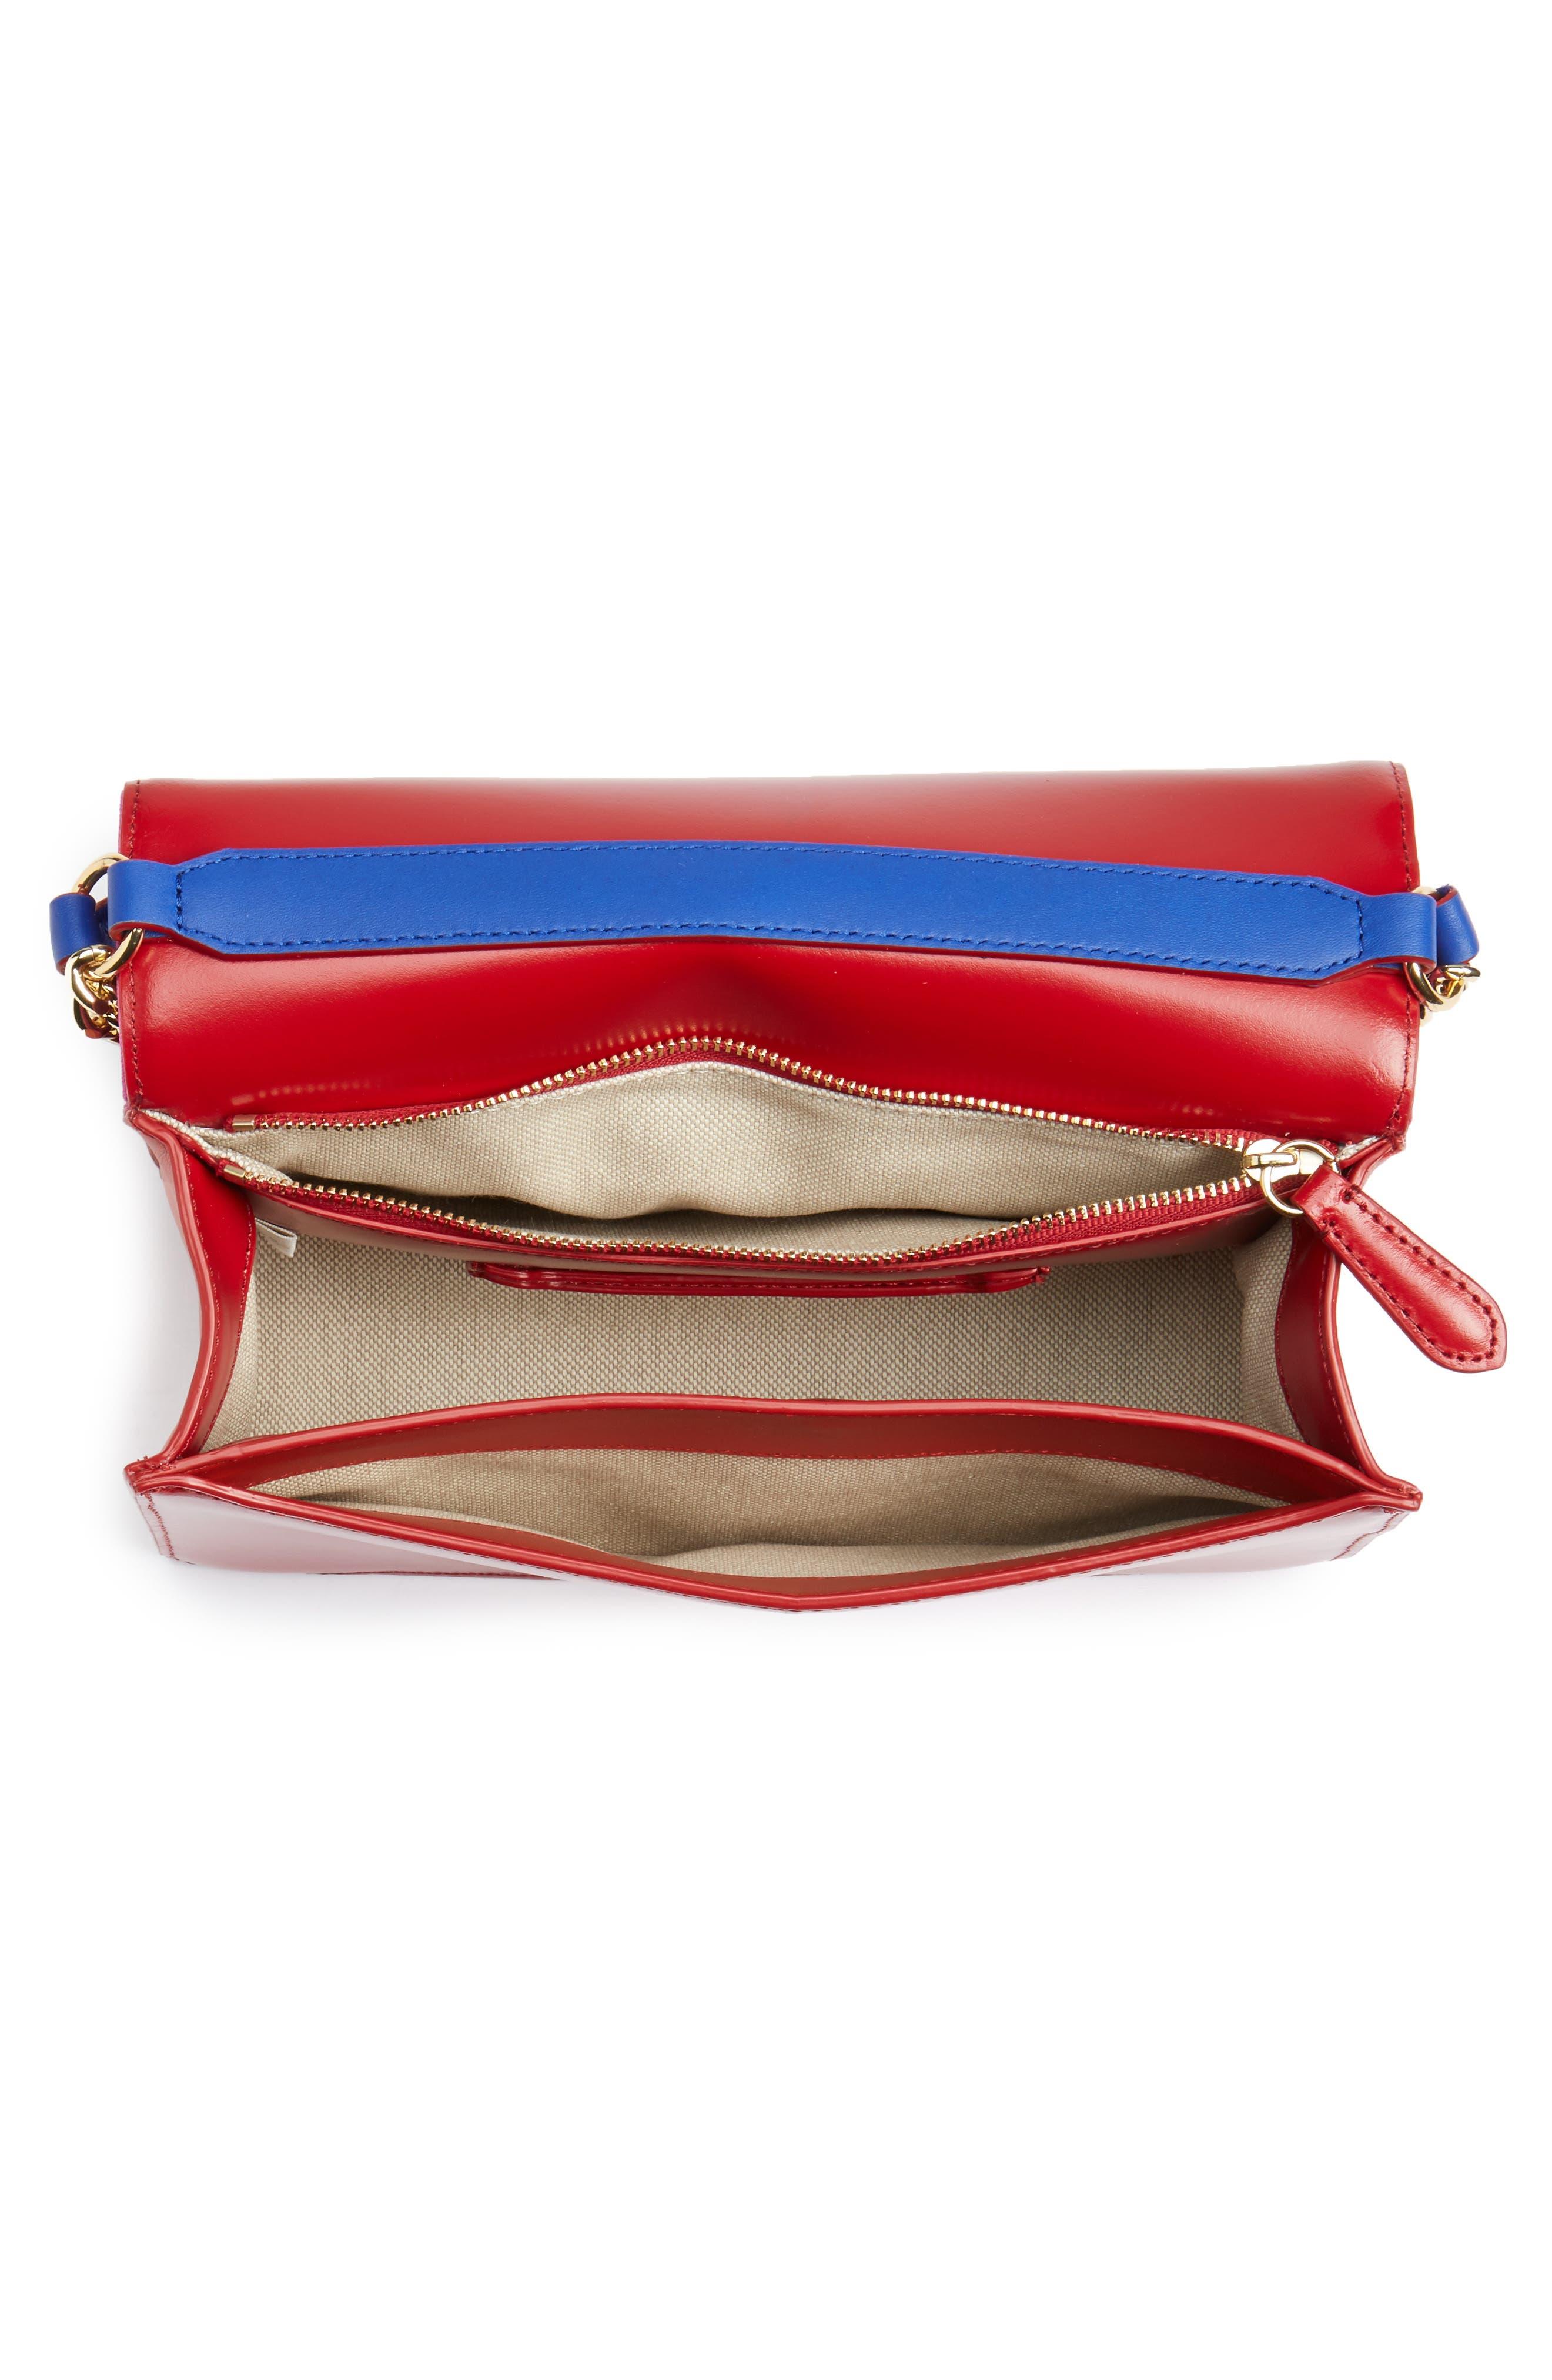 Soirée Satin & Leather Top Handle Bag,                             Alternate thumbnail 4, color,                             Pink